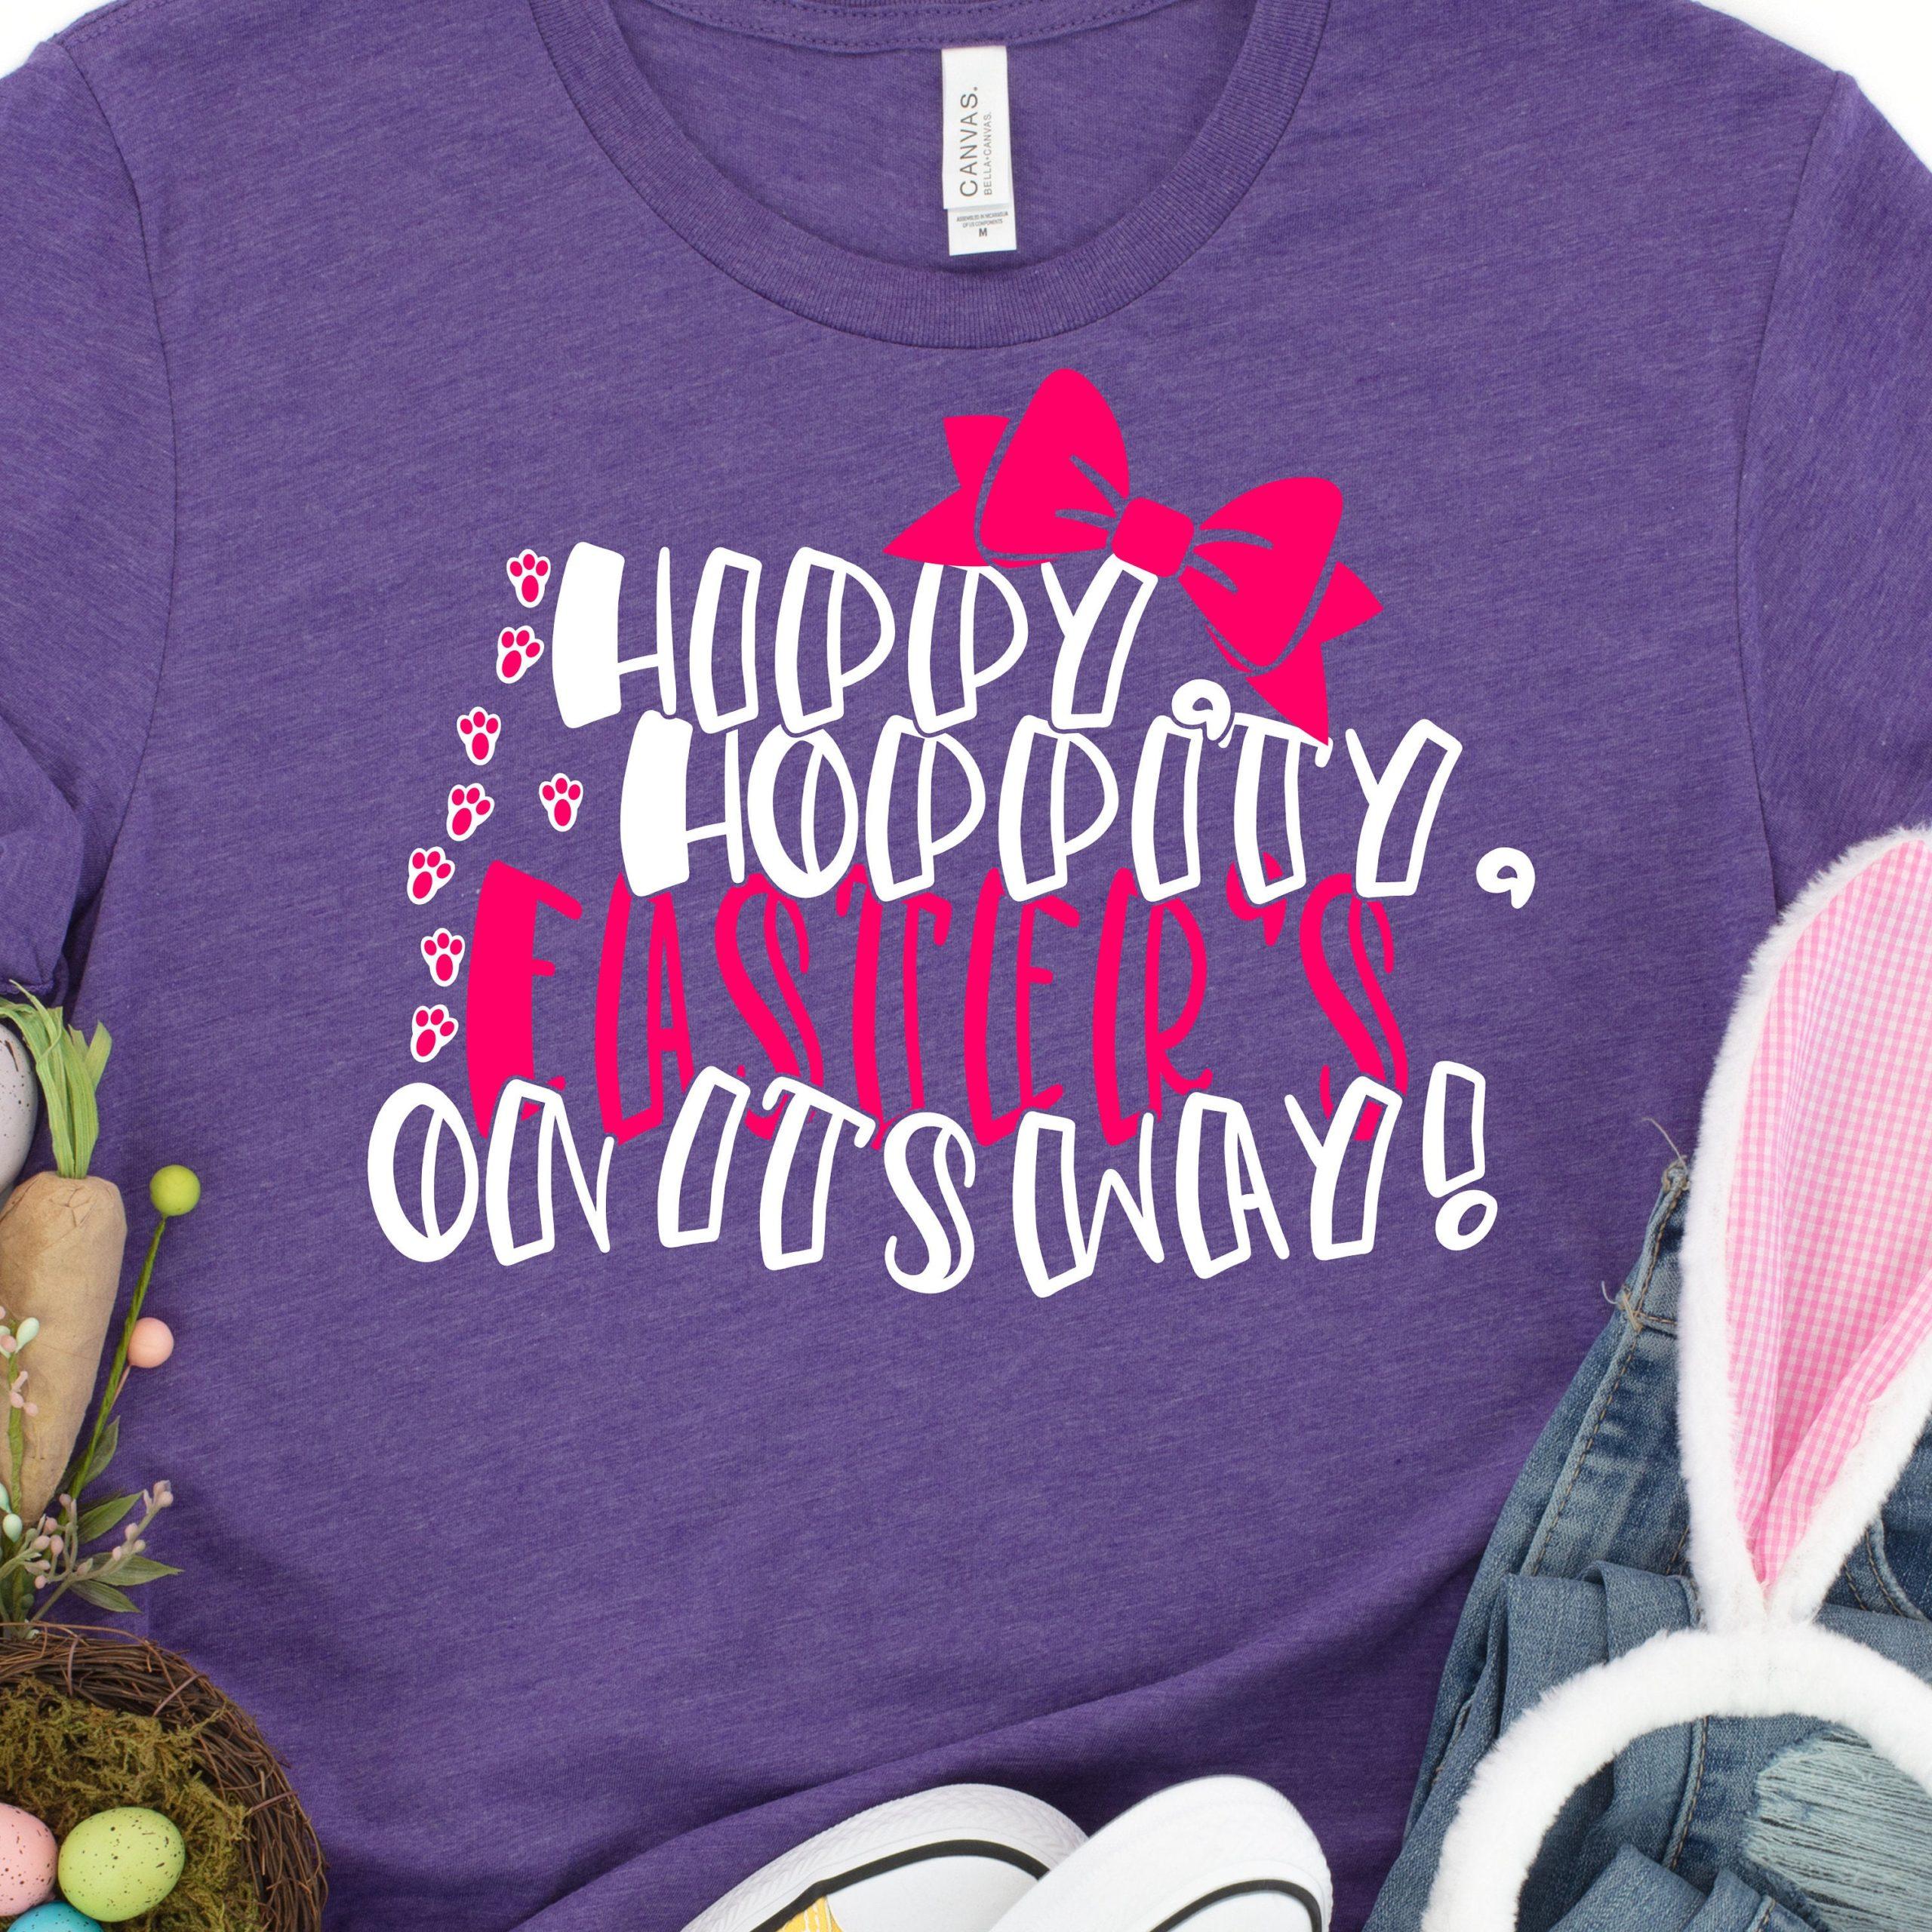 Easter-svg-hoppy-easter-svg-hoppity-easter-svg-easter-bunny-svg-easter-candy-svg-easter-svg-design-easter-cut-file-easter-cricut-svg-60513b85